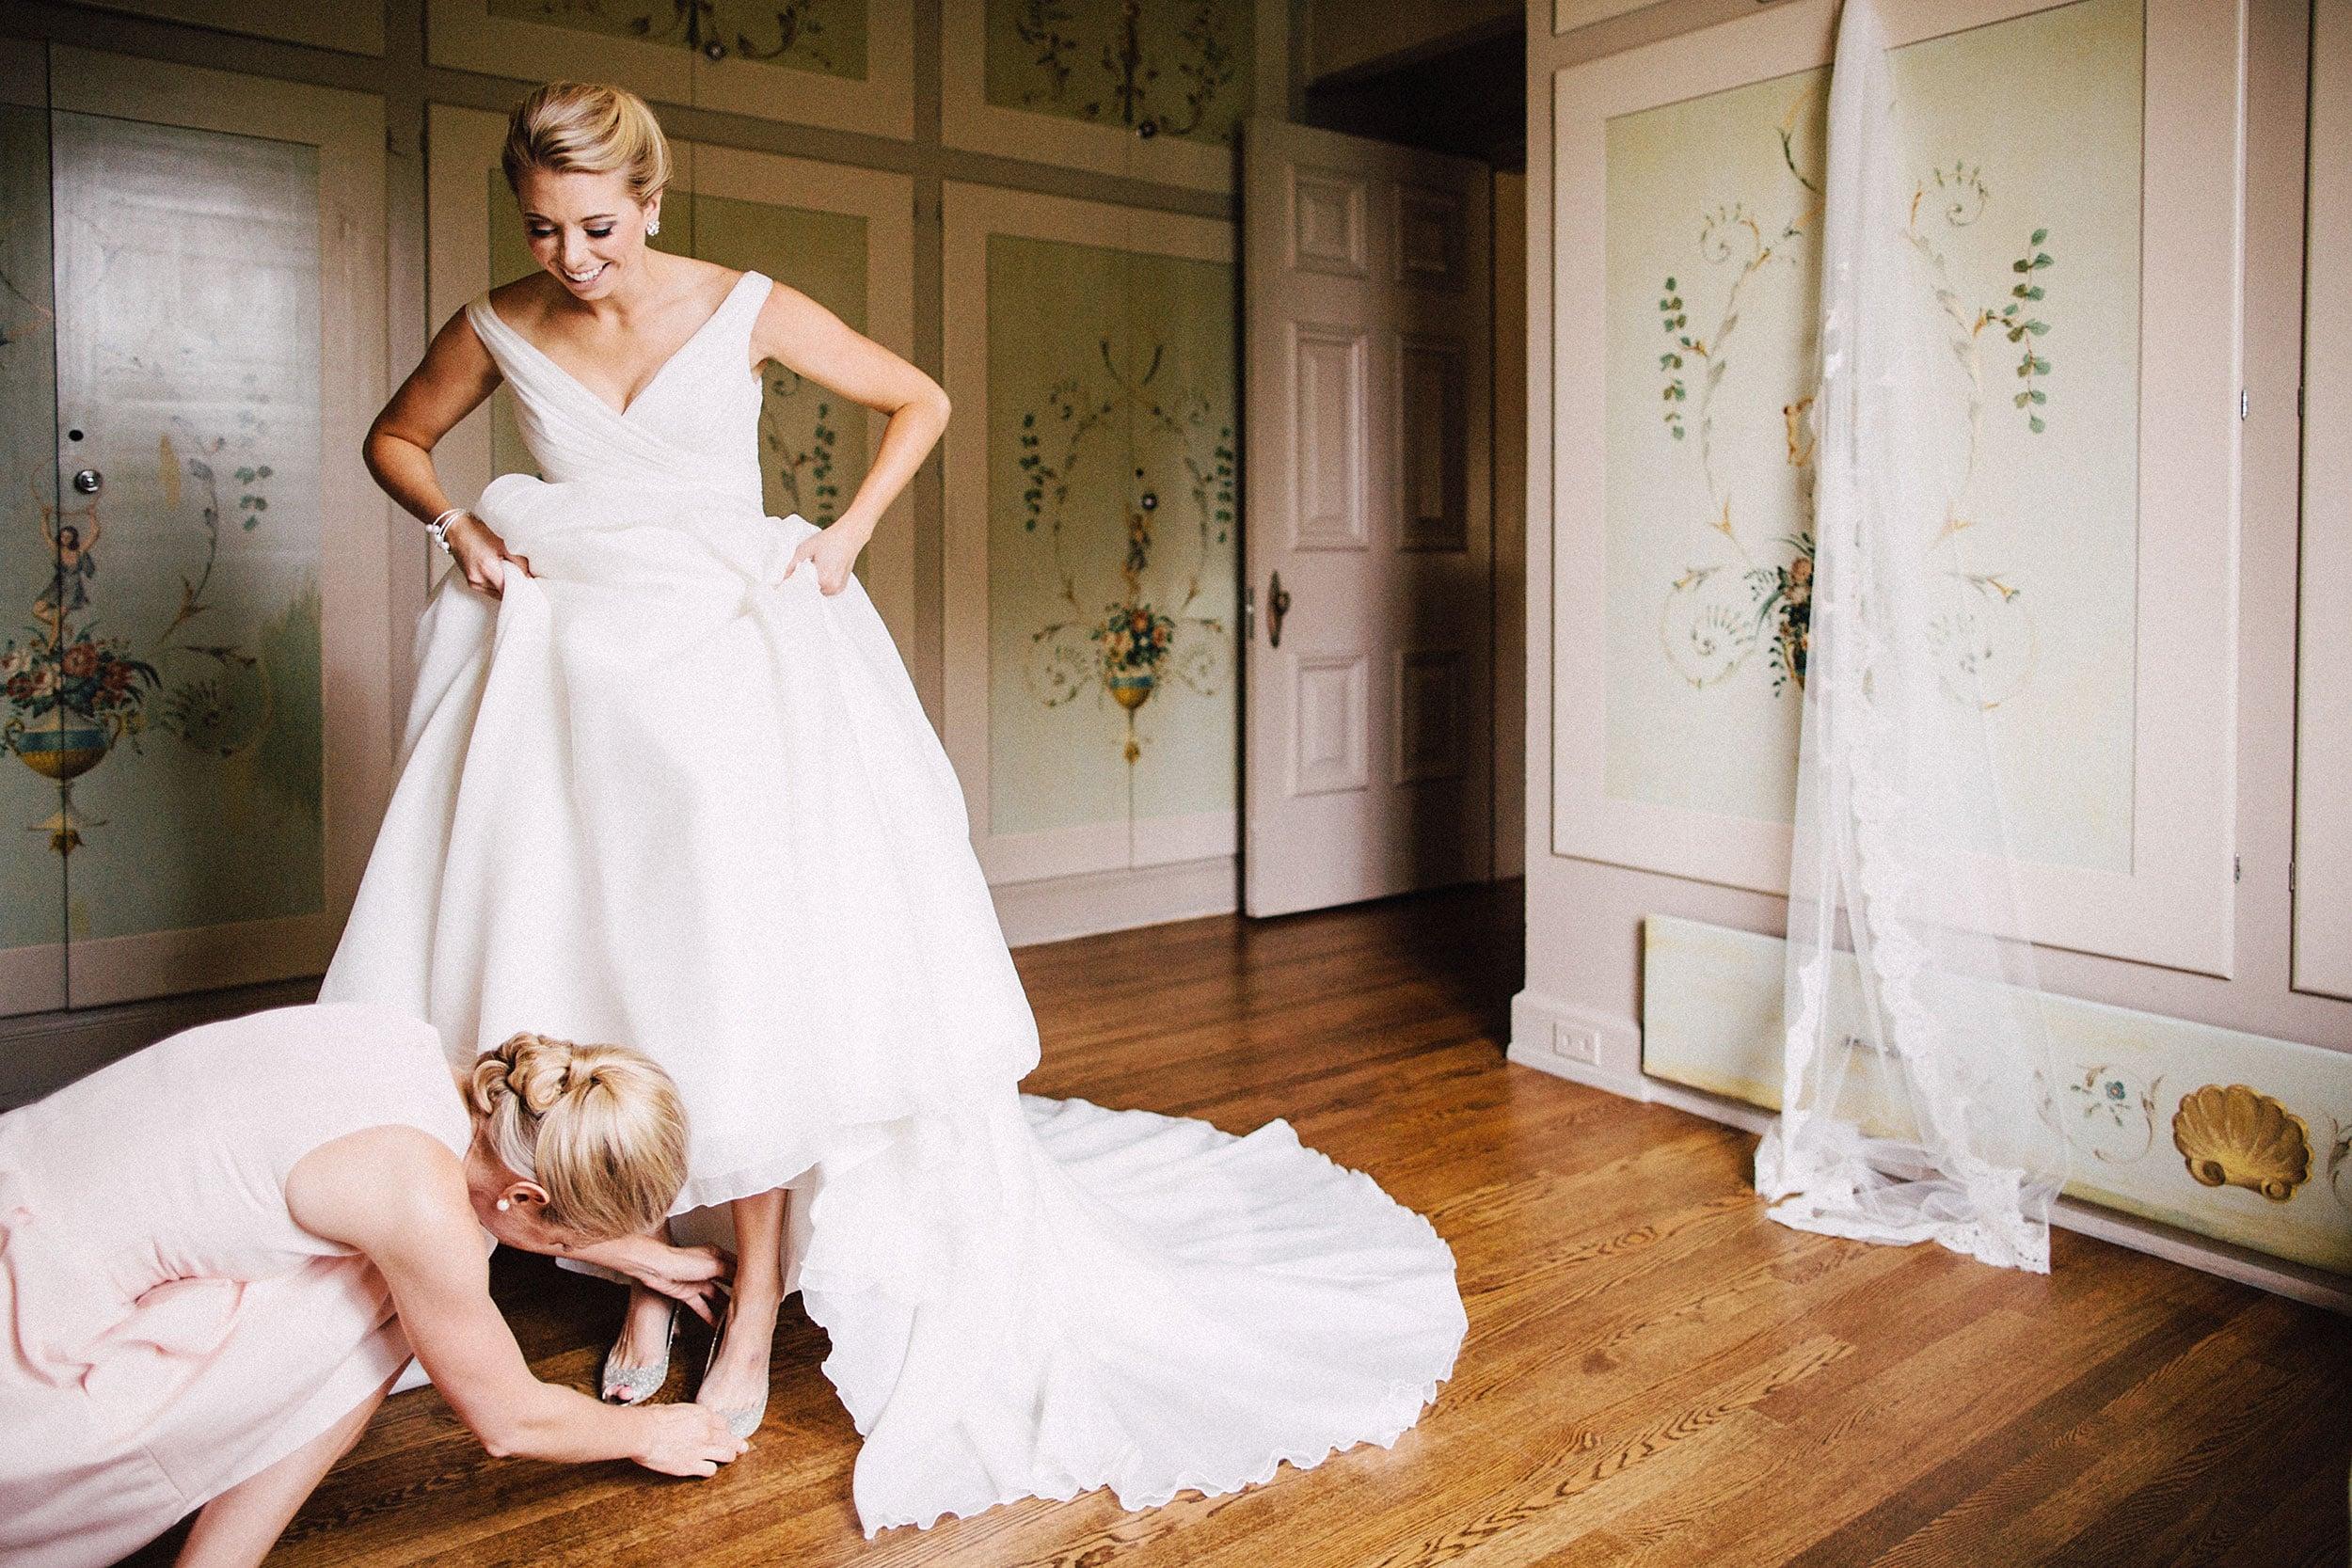 spindletop-lexington-wedding-photographer-008.JPG